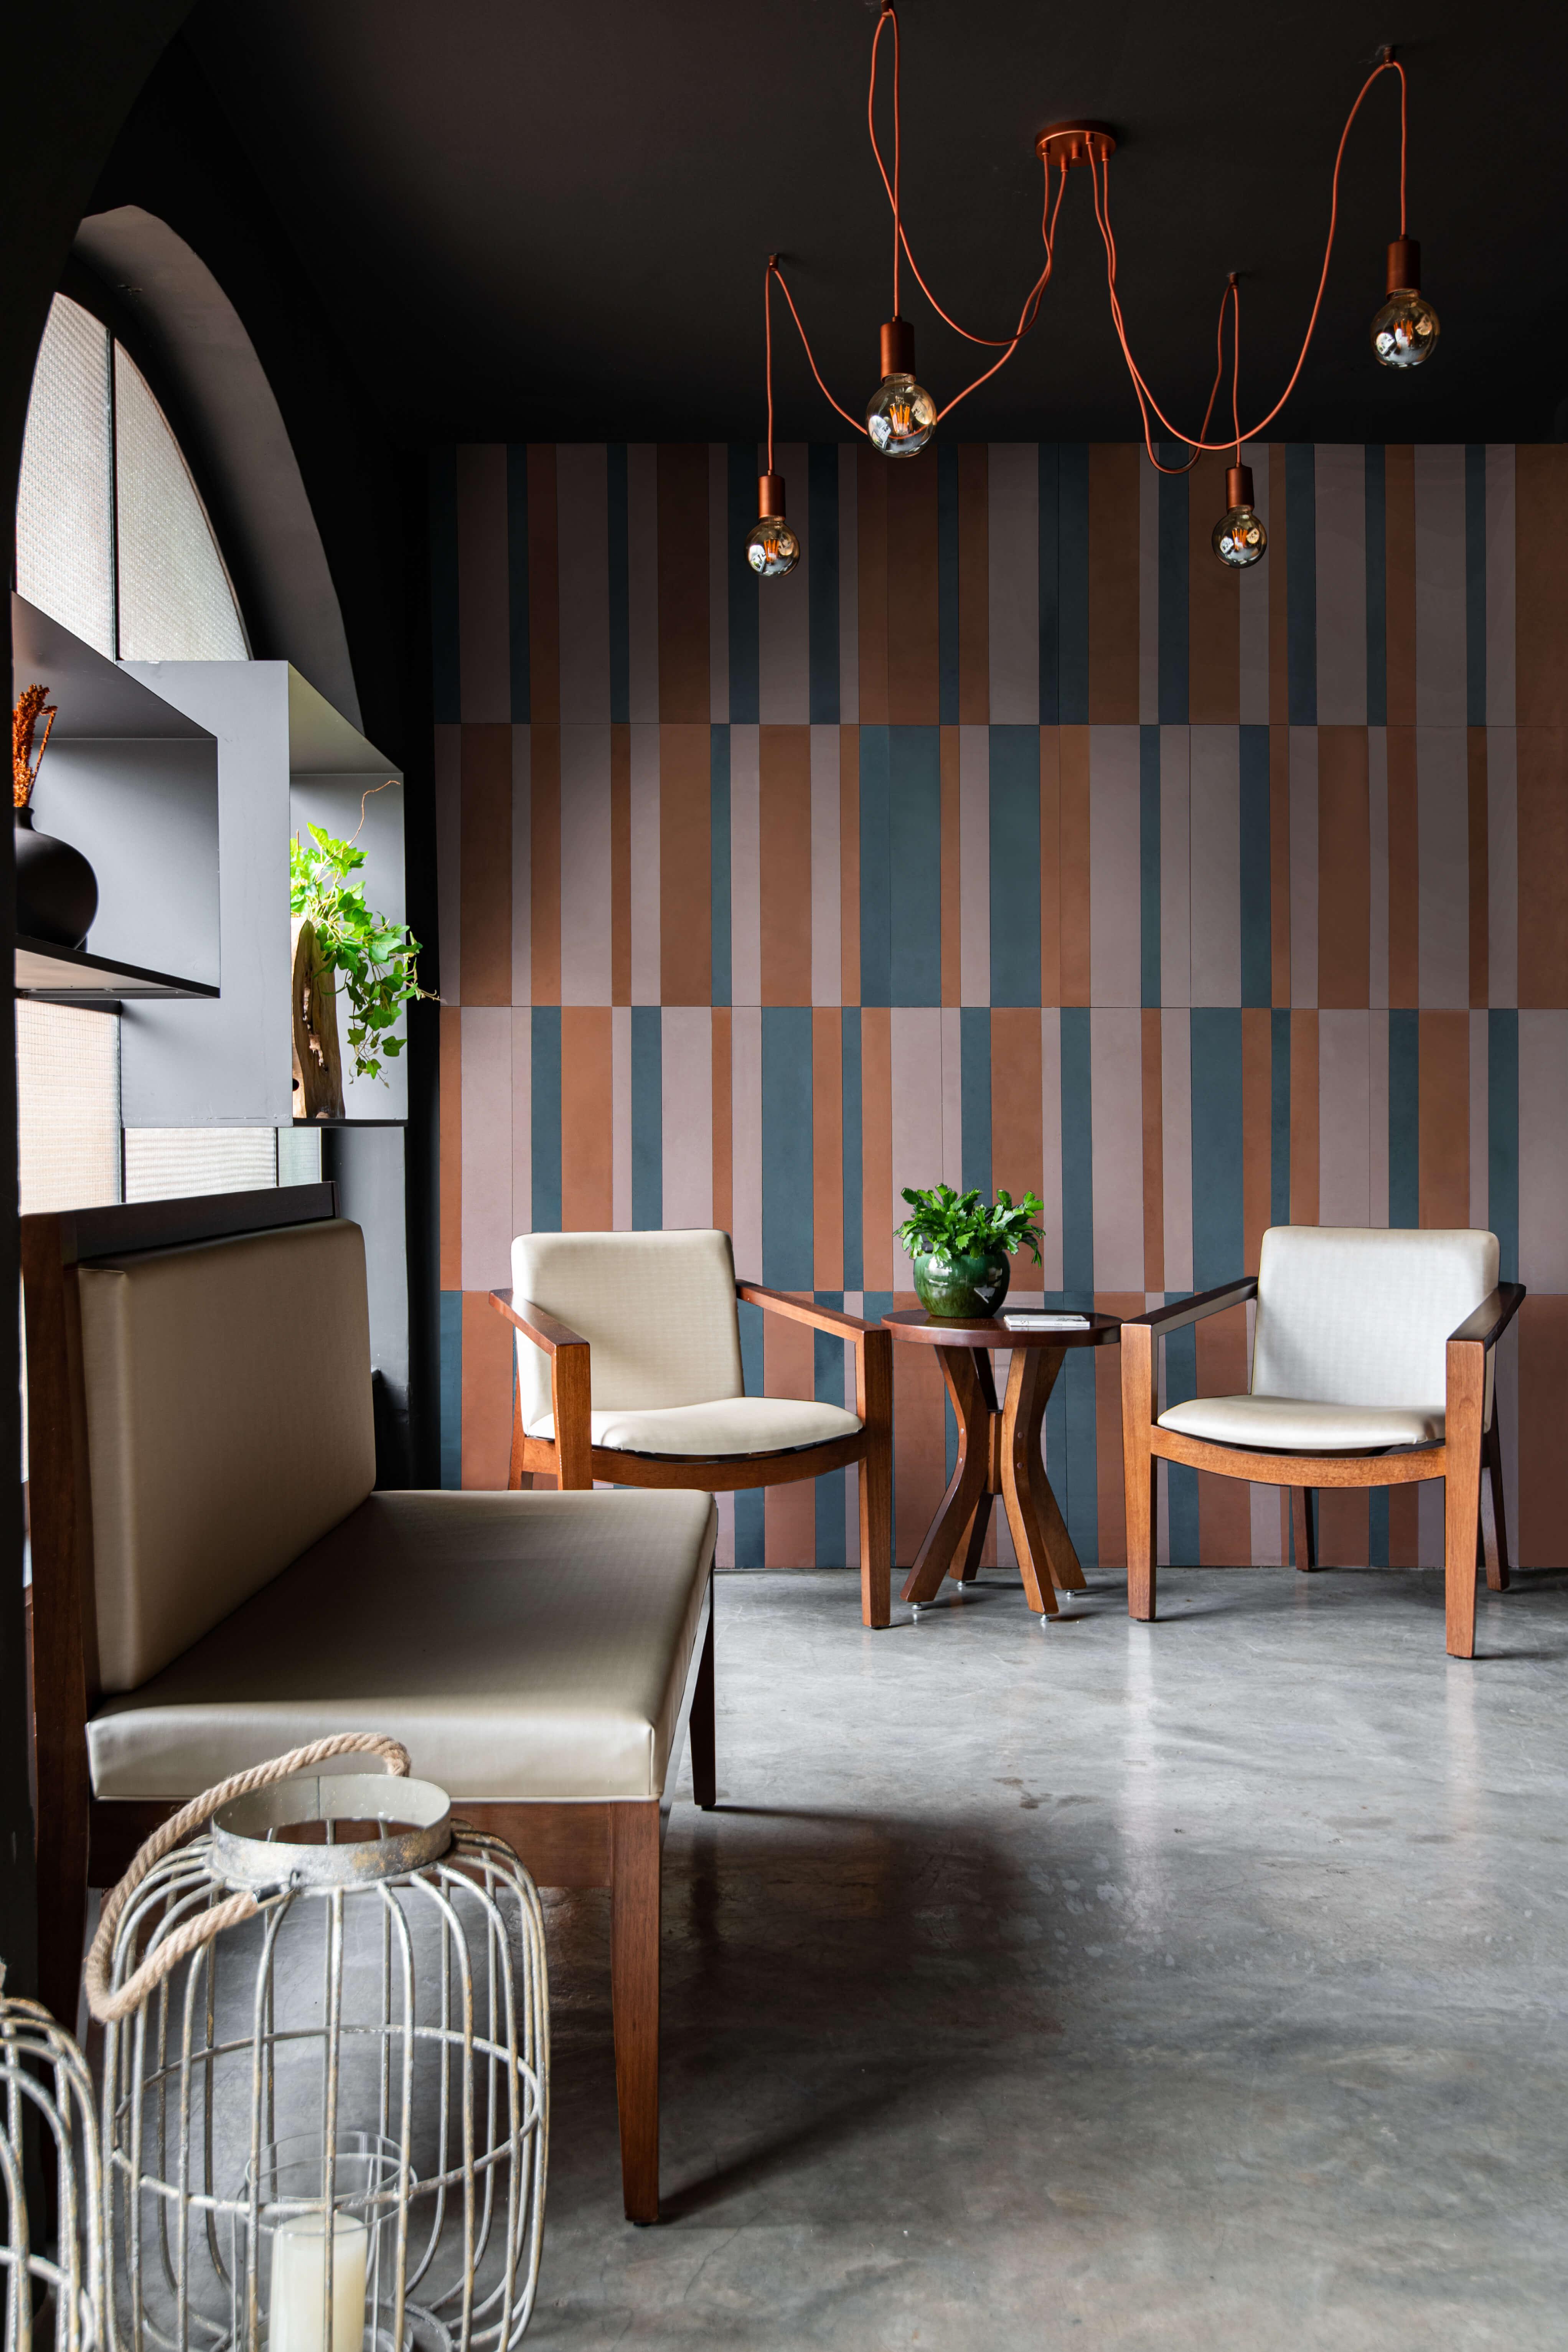 Palette Colors Réguas - Esc. Vertentes Arquitetura - Foto Favaro Jr.